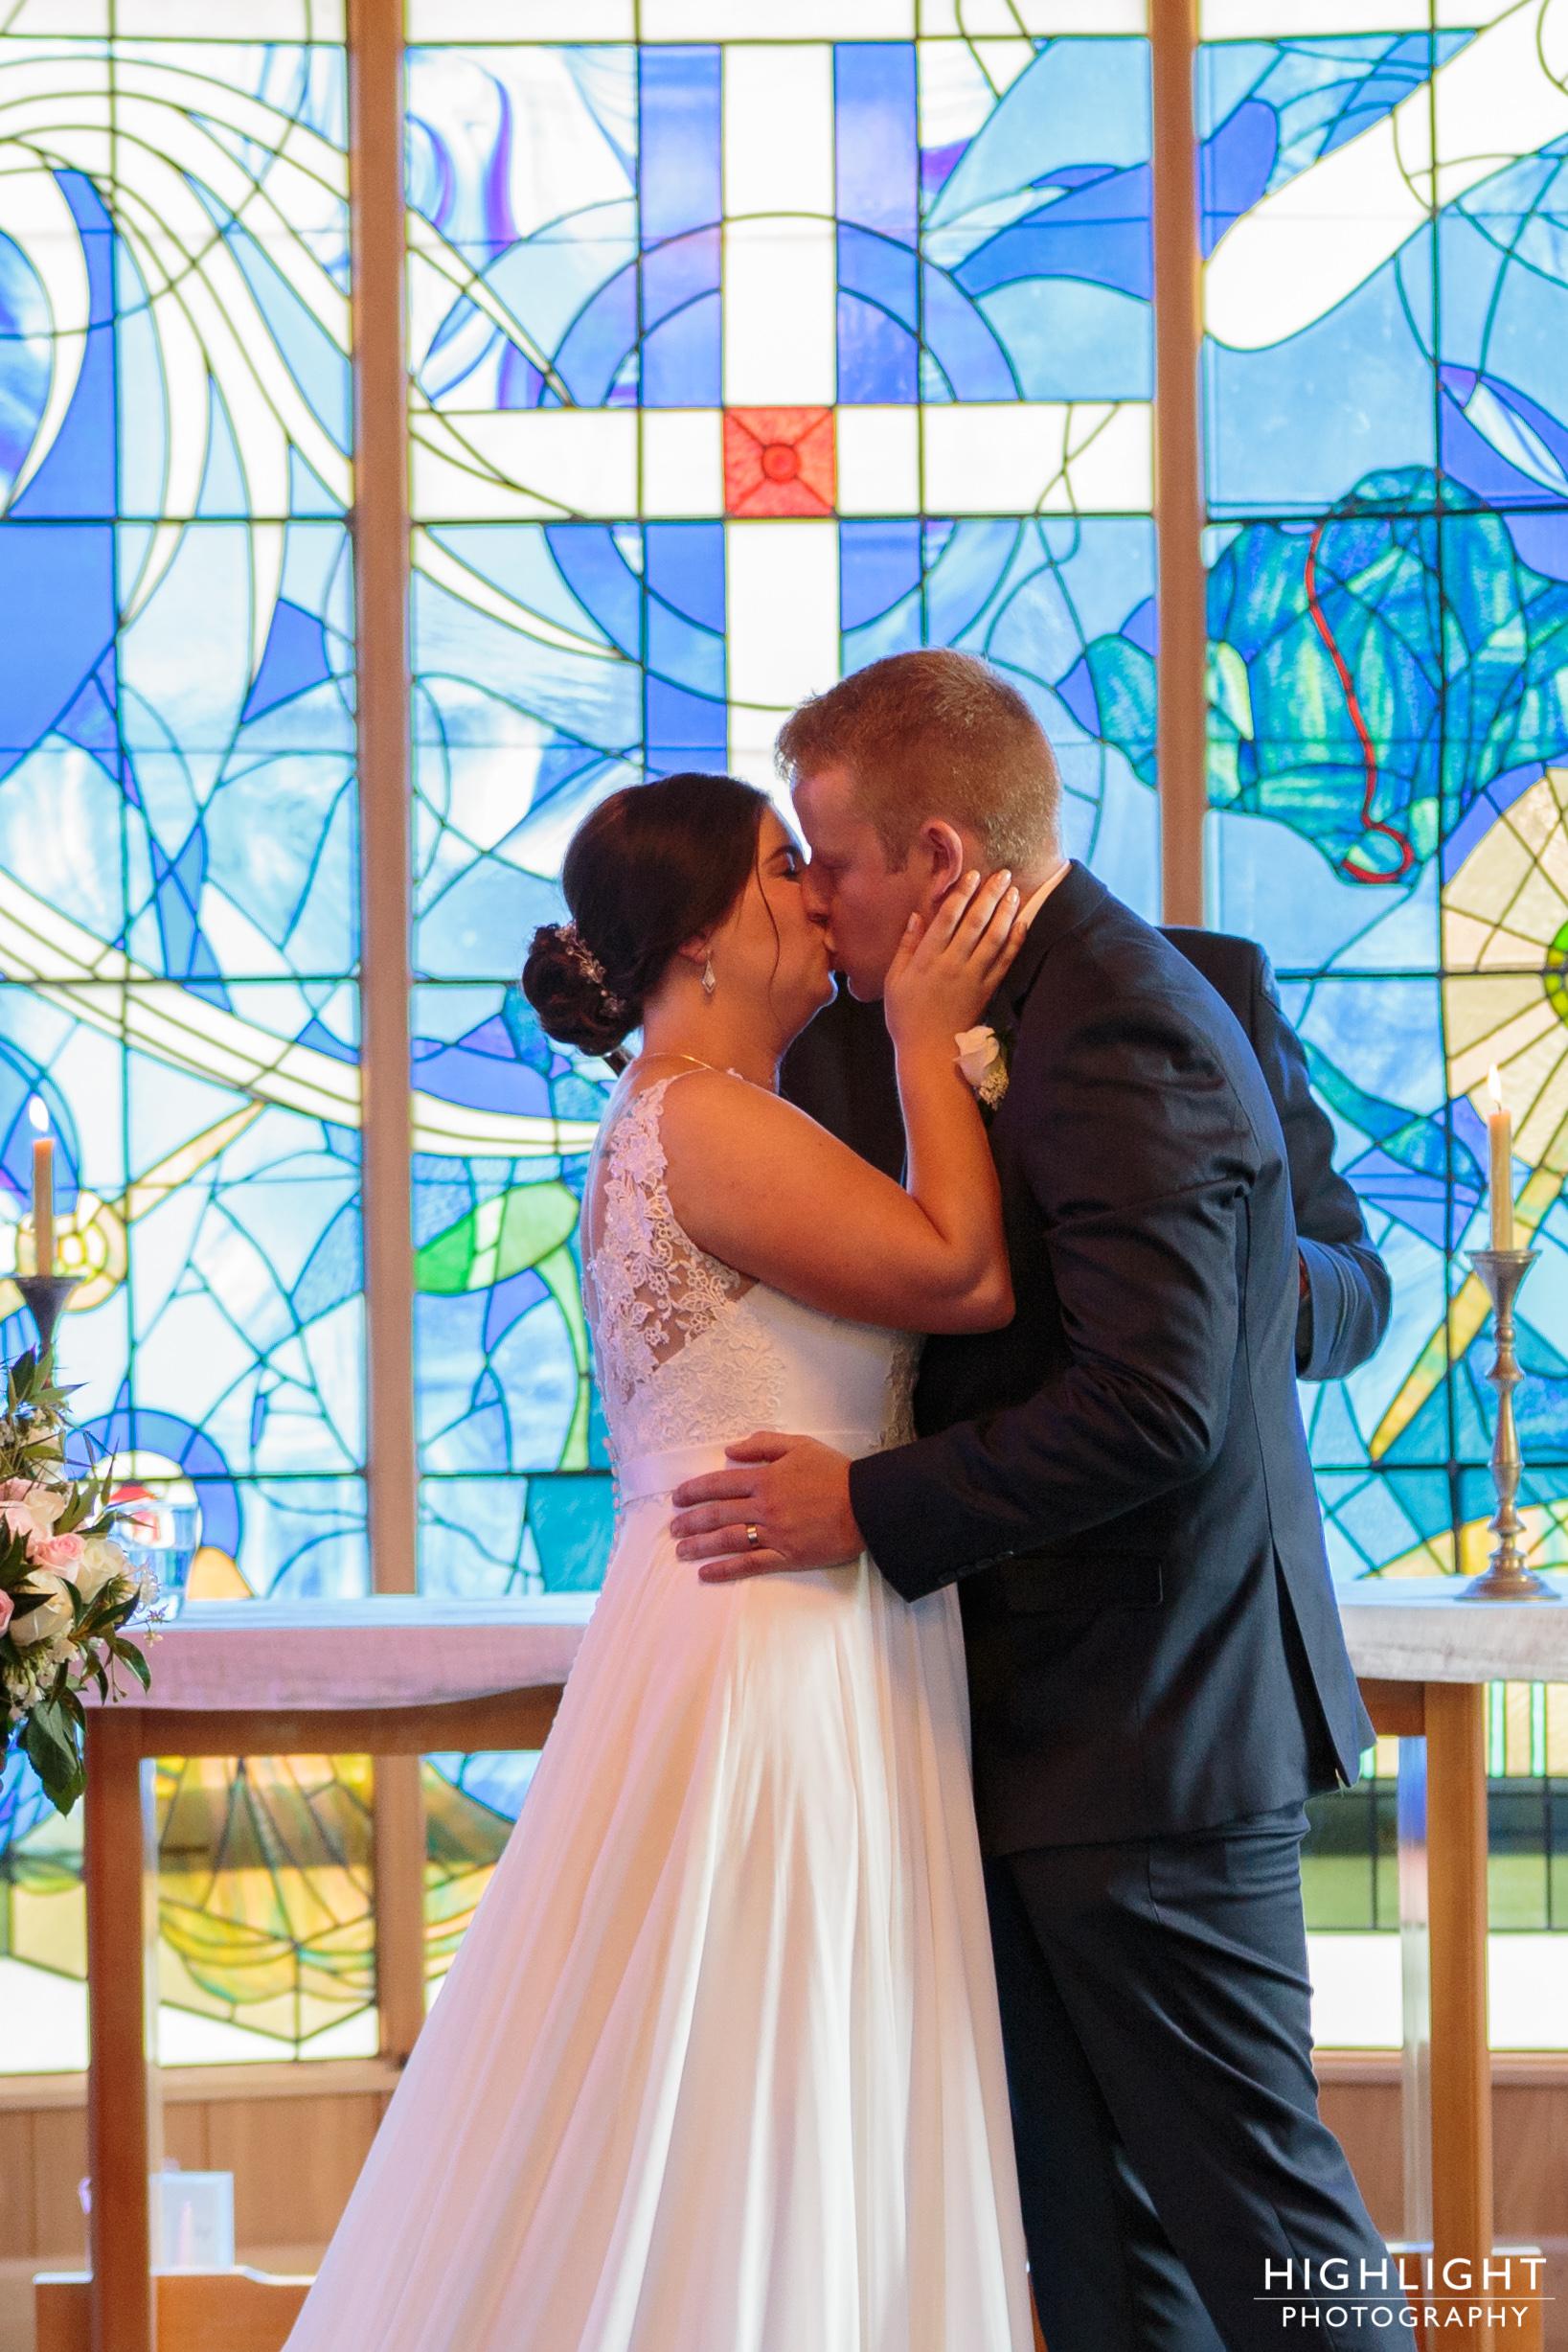 JM-2017-Highlight-wedding-photography-palmerston-north-new-zealand-64.jpg